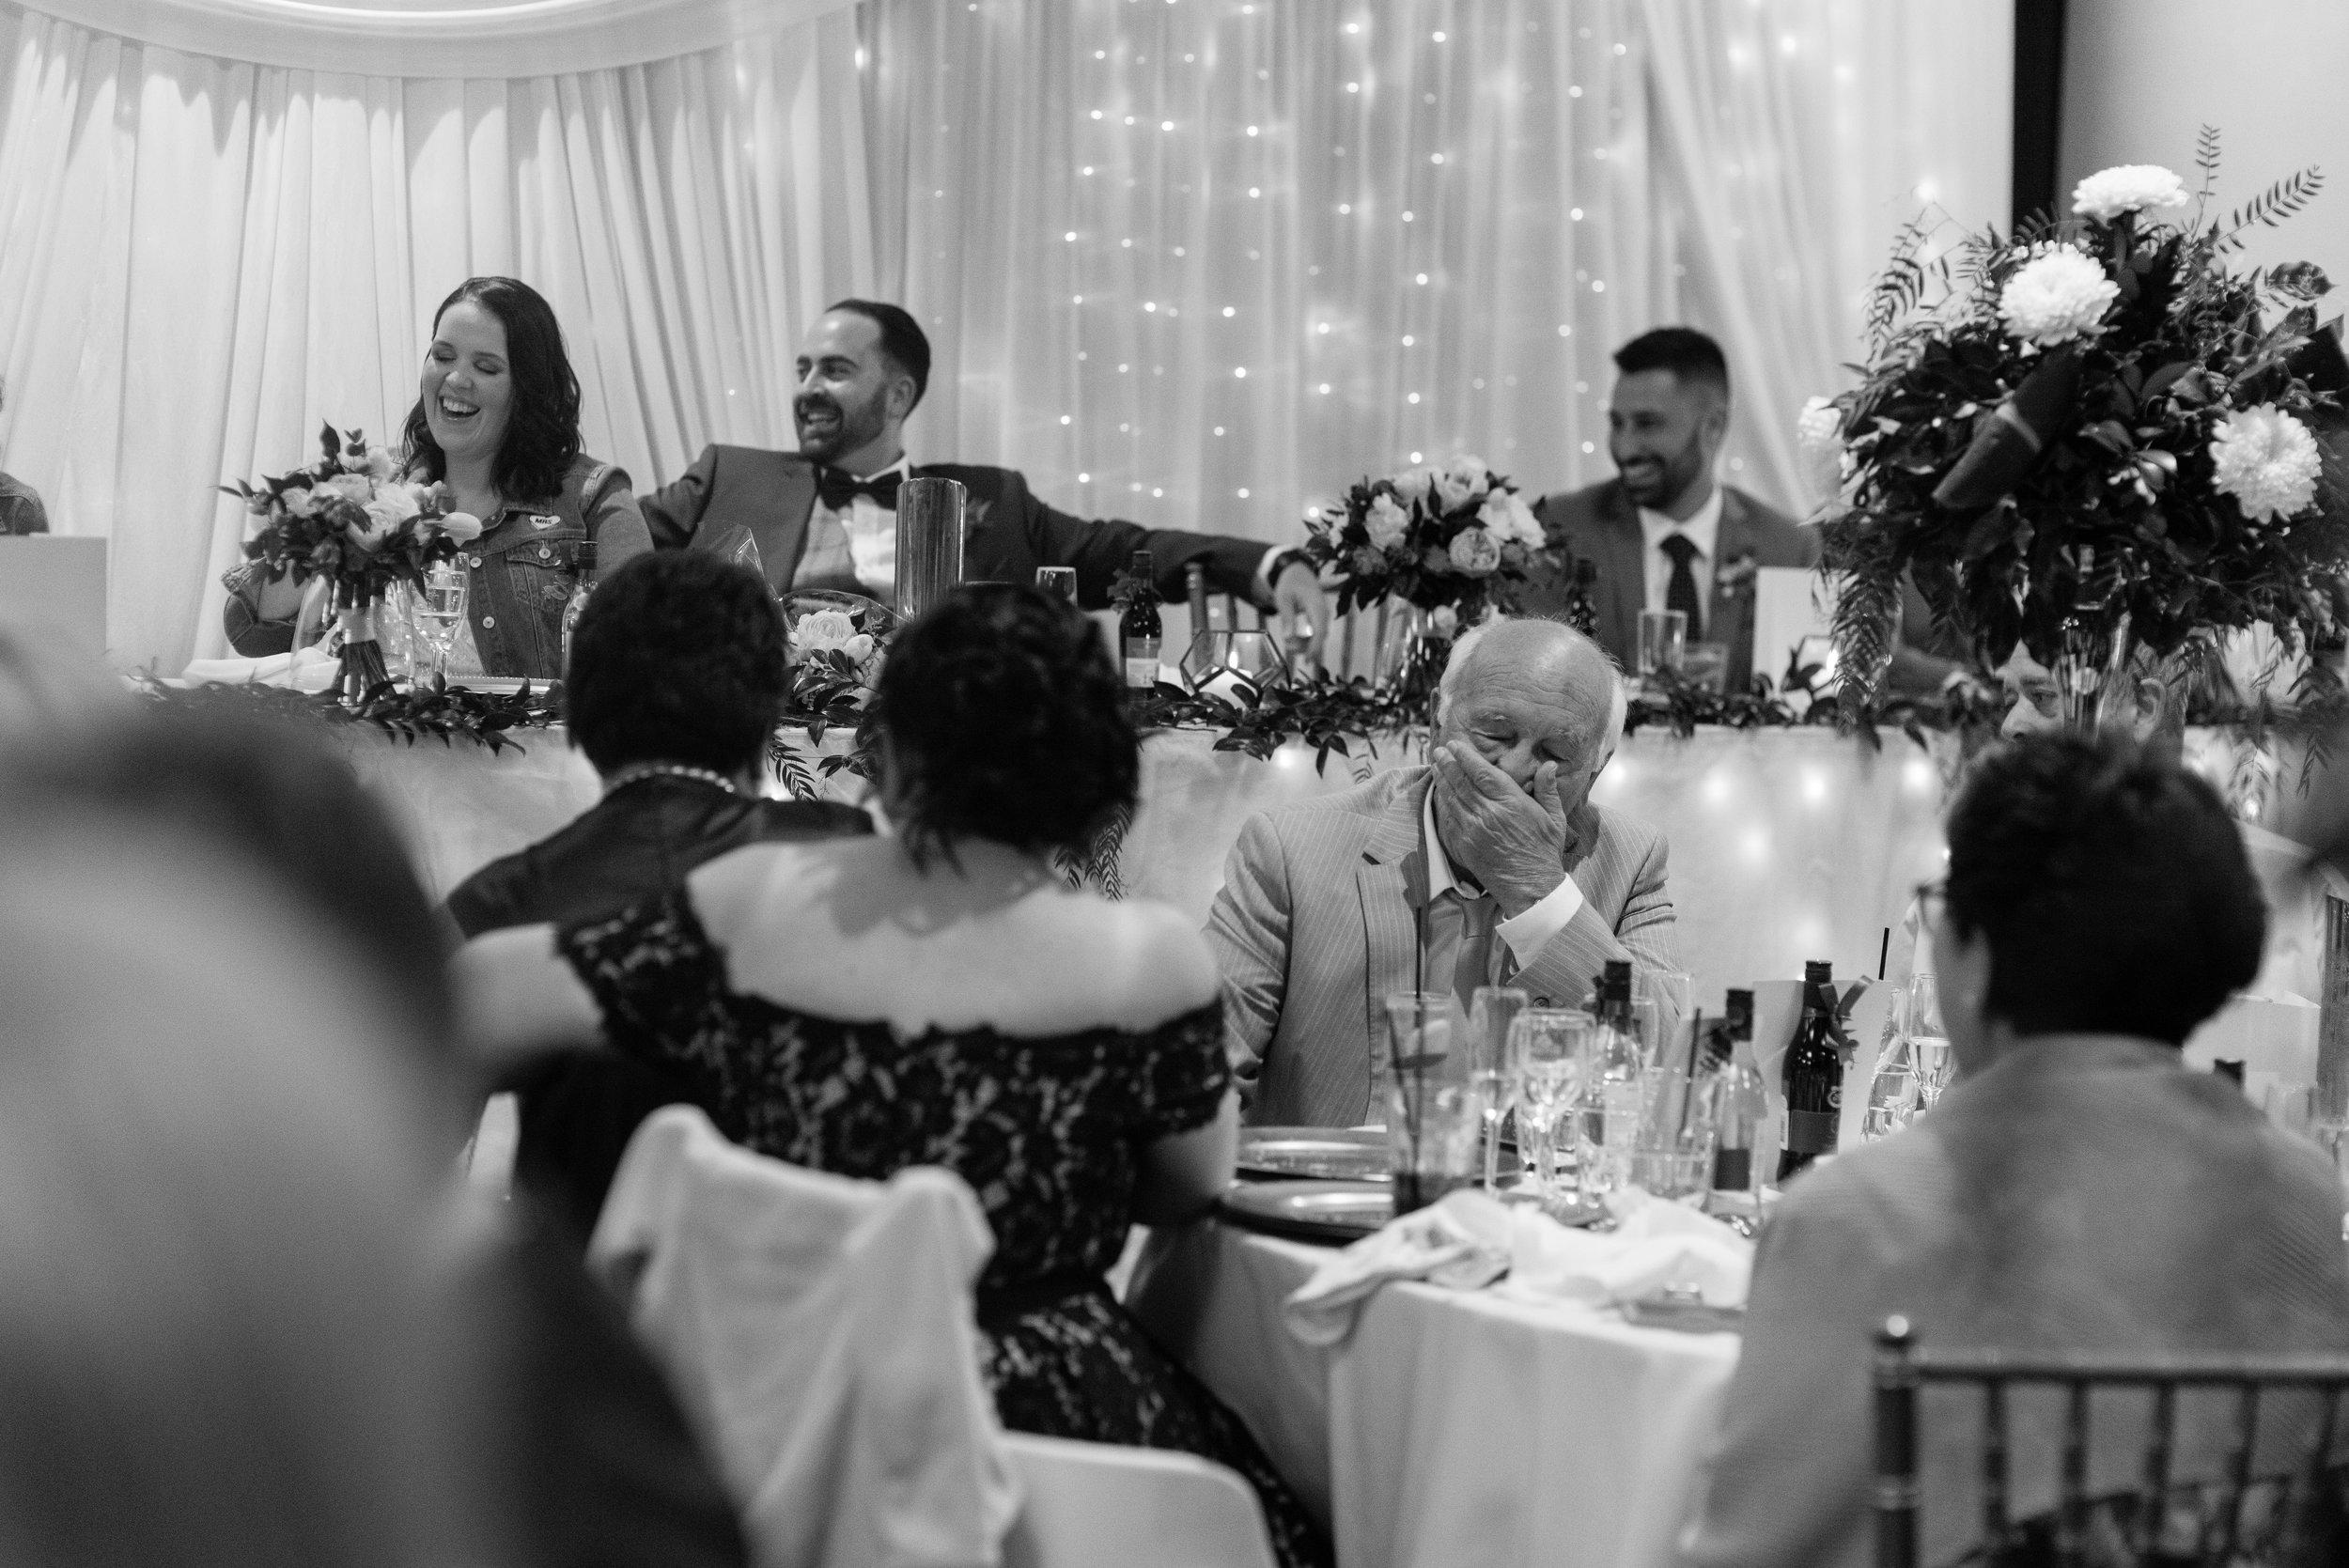 brisbane-city-wedding-photographer-romantic-wedding-103.jpg